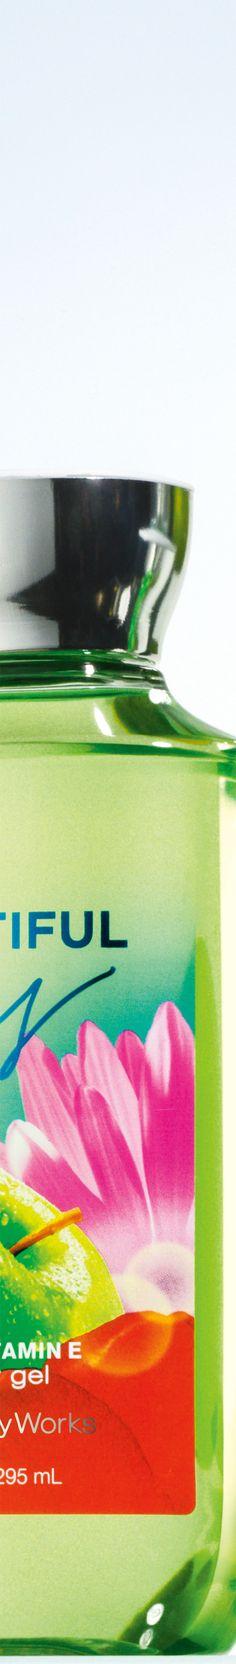 #BeautifulDay fragranc fan, bodi worksenough, milan darlin